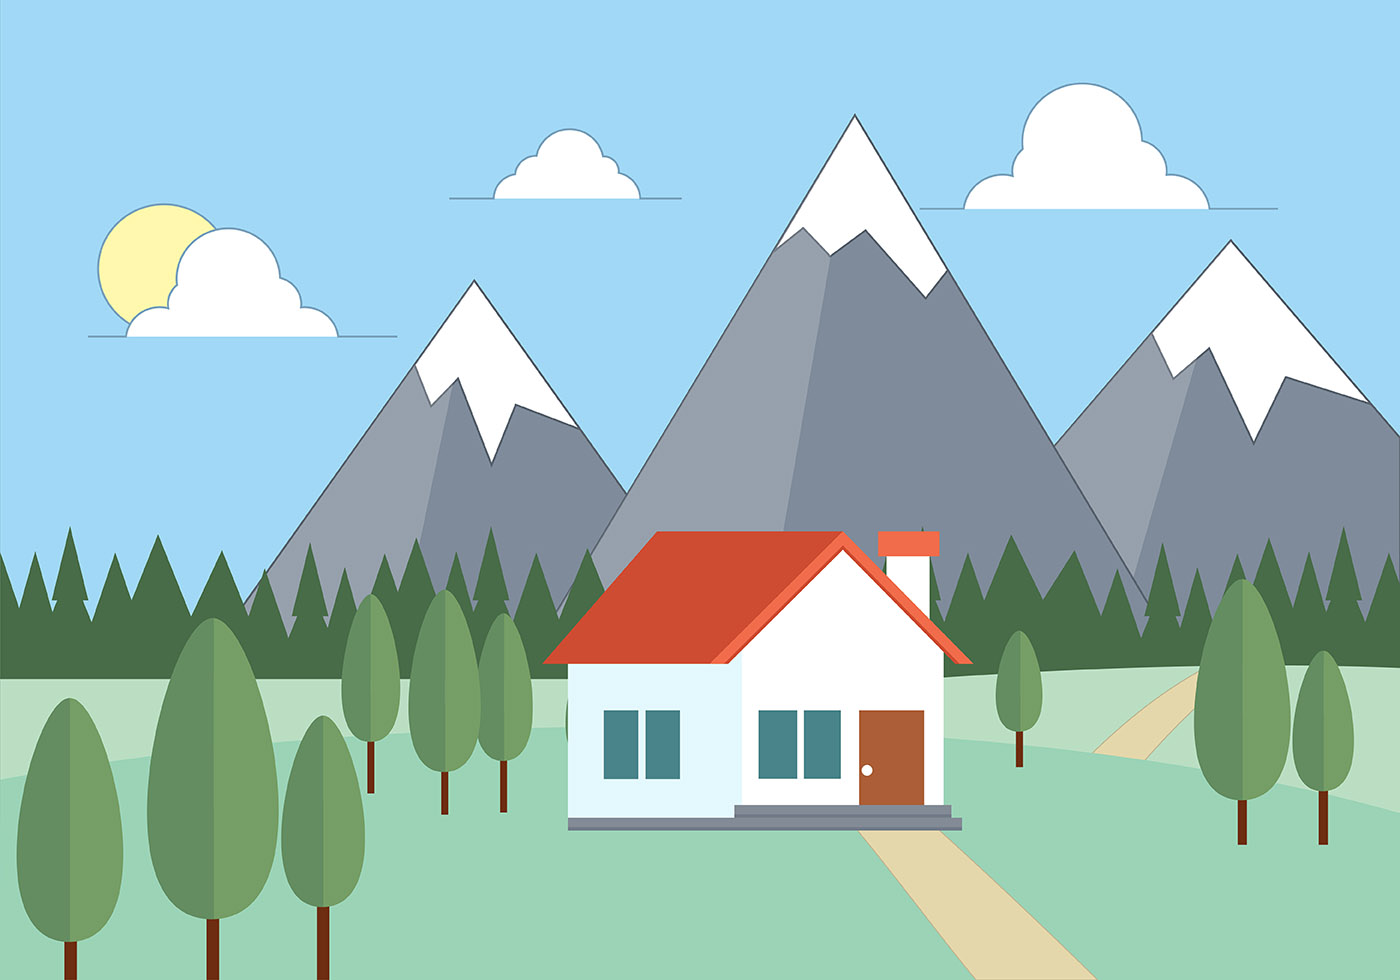 Landscape Illustration Vector Free: Free Flat Vector Landscape Illustration